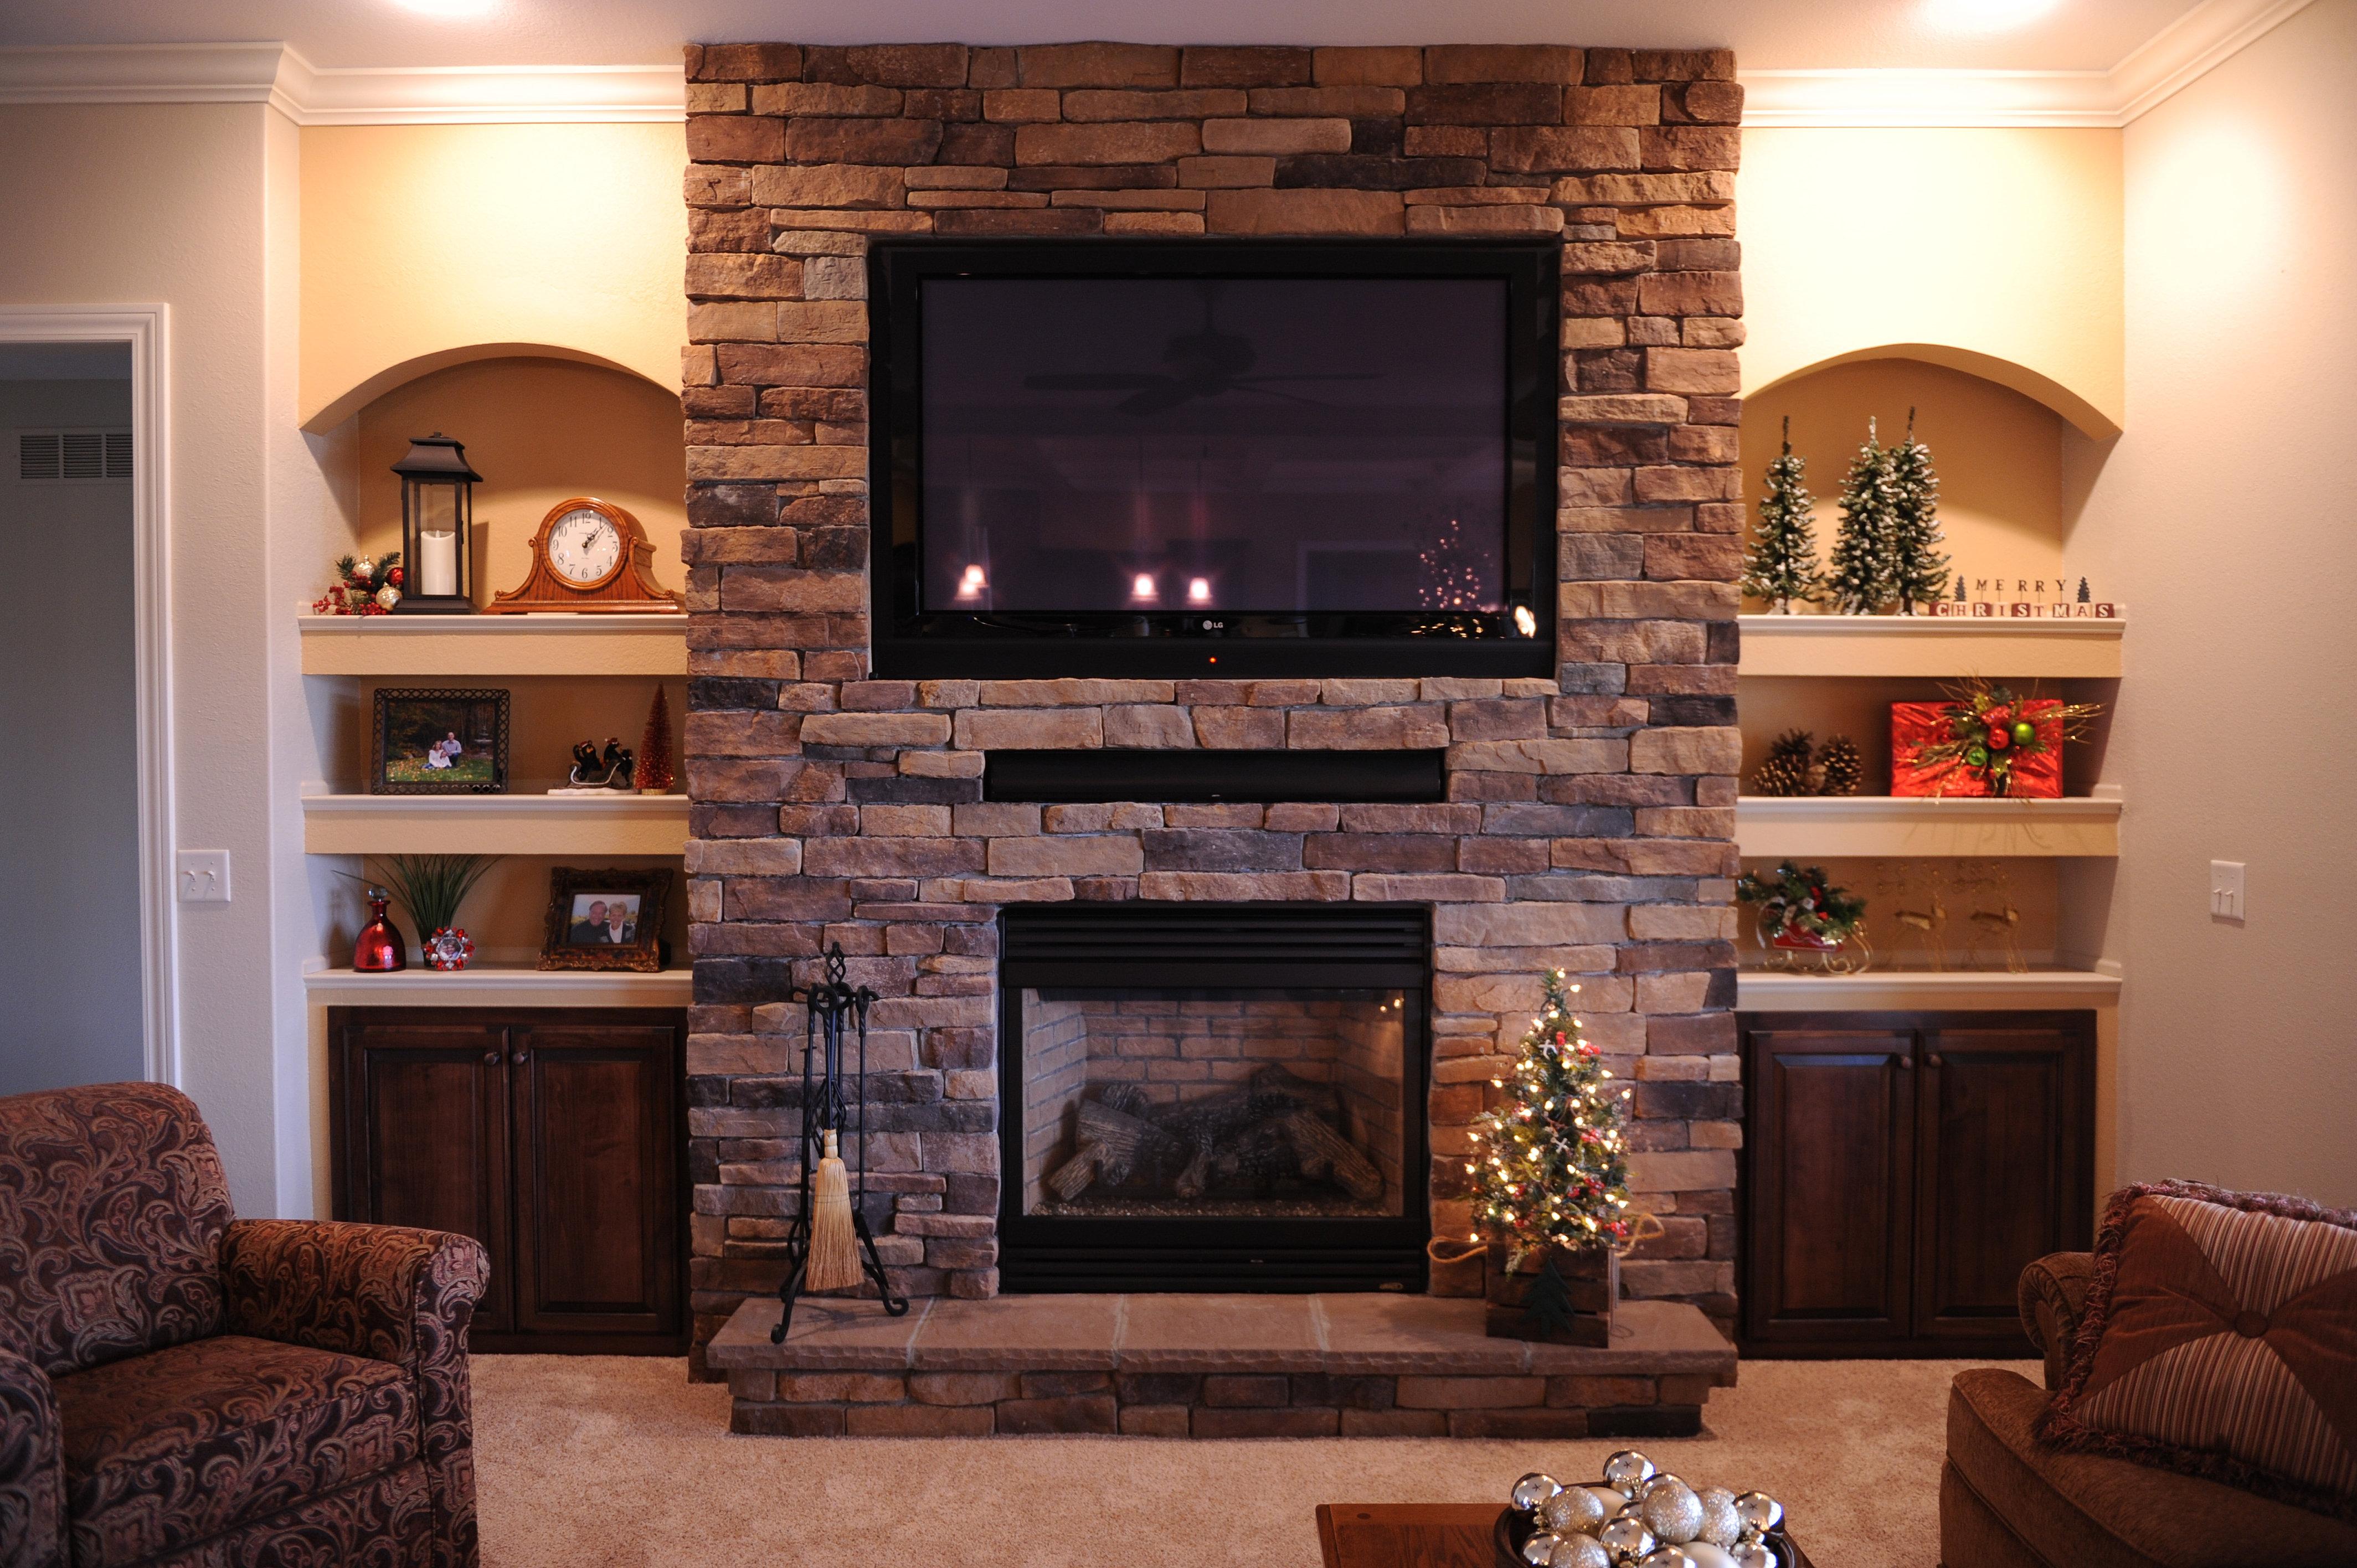 lustig custom cabinets kitchens fireplace built ins